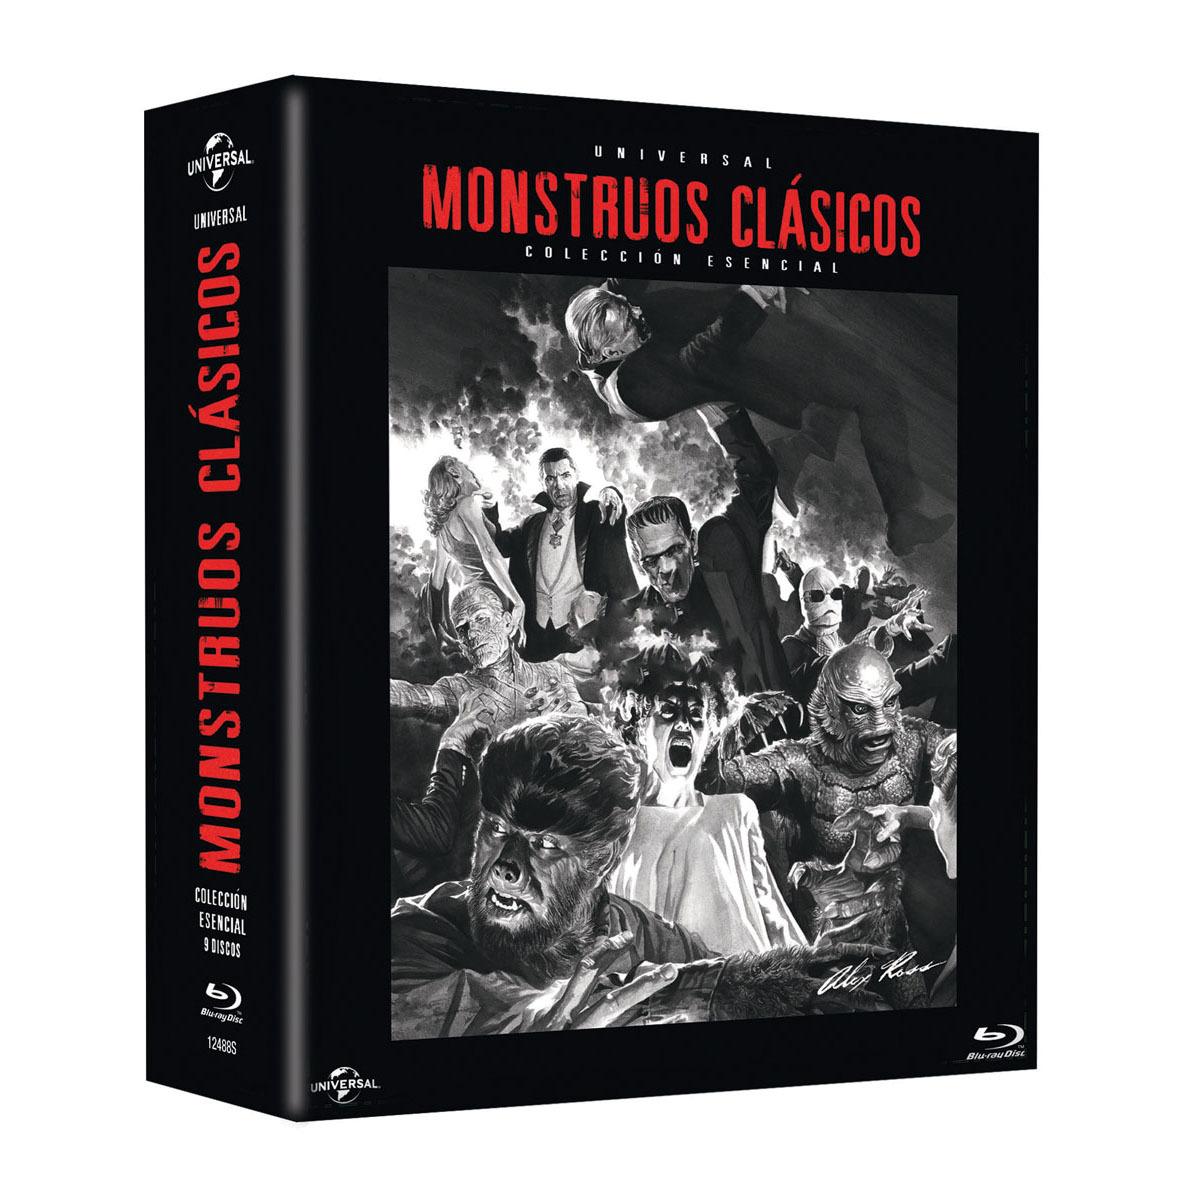 Pack Monstruos Clásicos Universal (Blu-Ray)